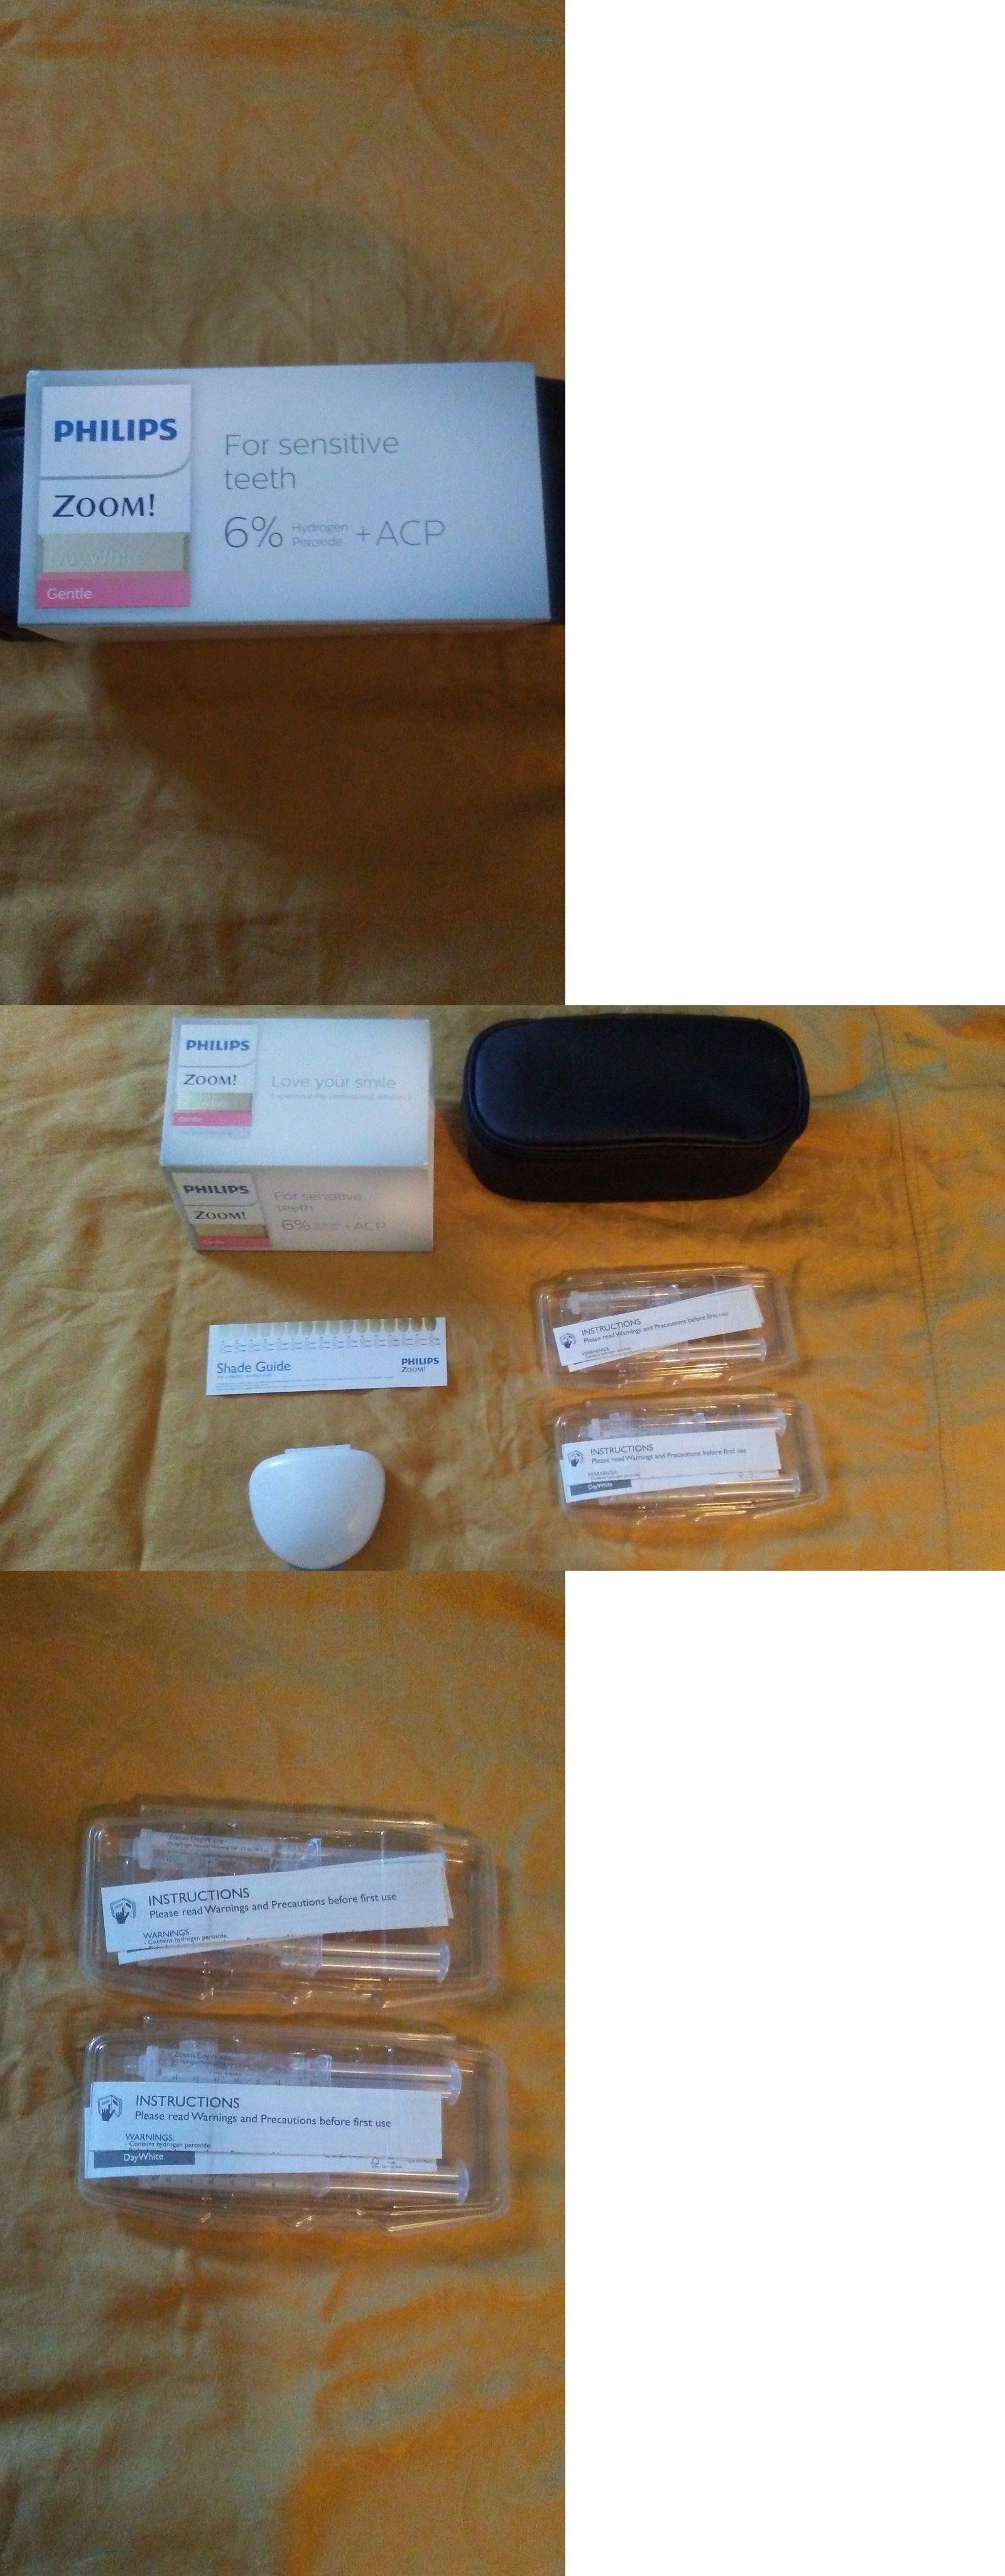 Whitening Philips Zoom Daywhite Take Home Whitening 6 Hydrogen Peroxide Acp